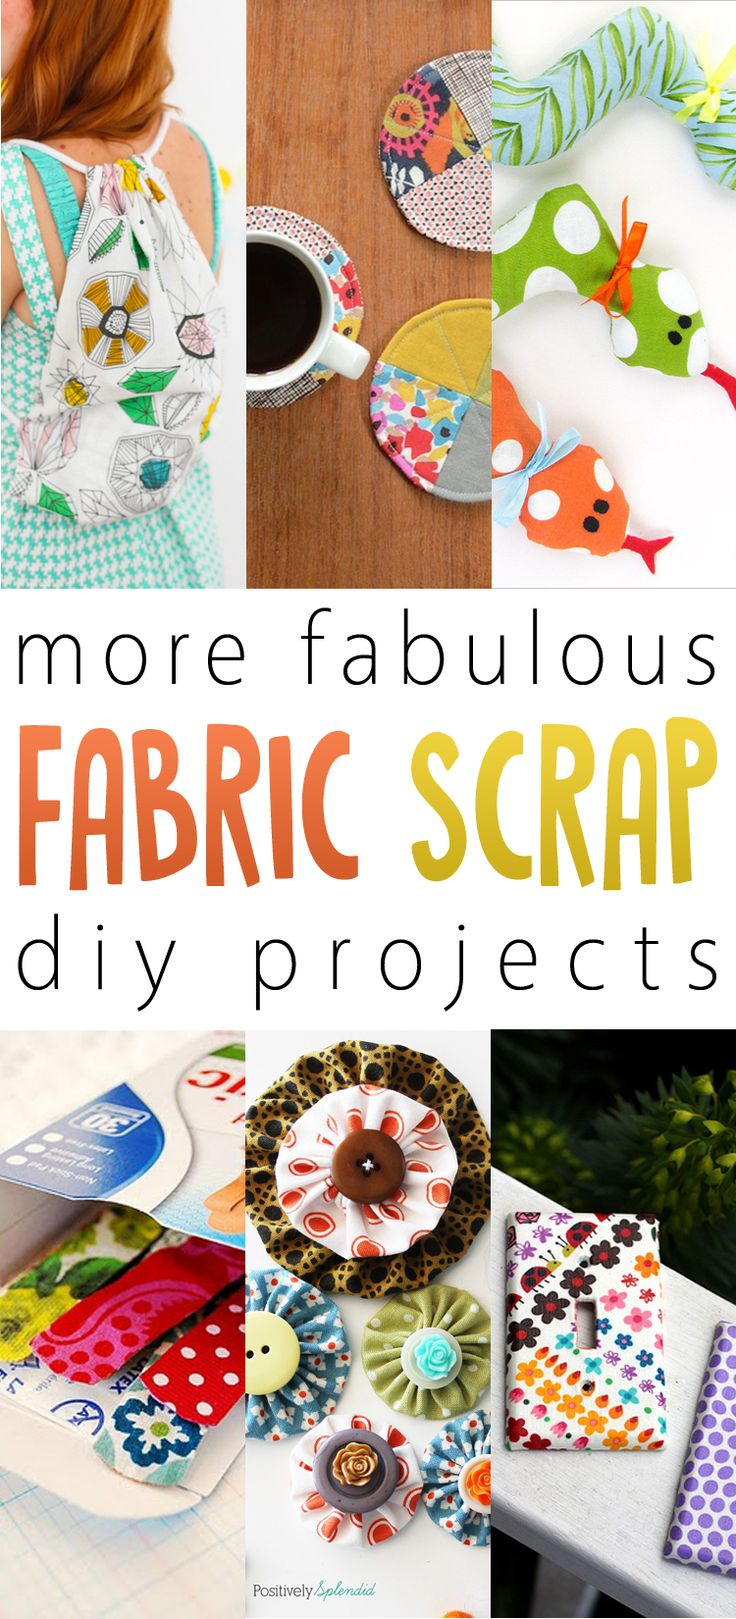 More Fabulous Fabric Scrap DIY Projects